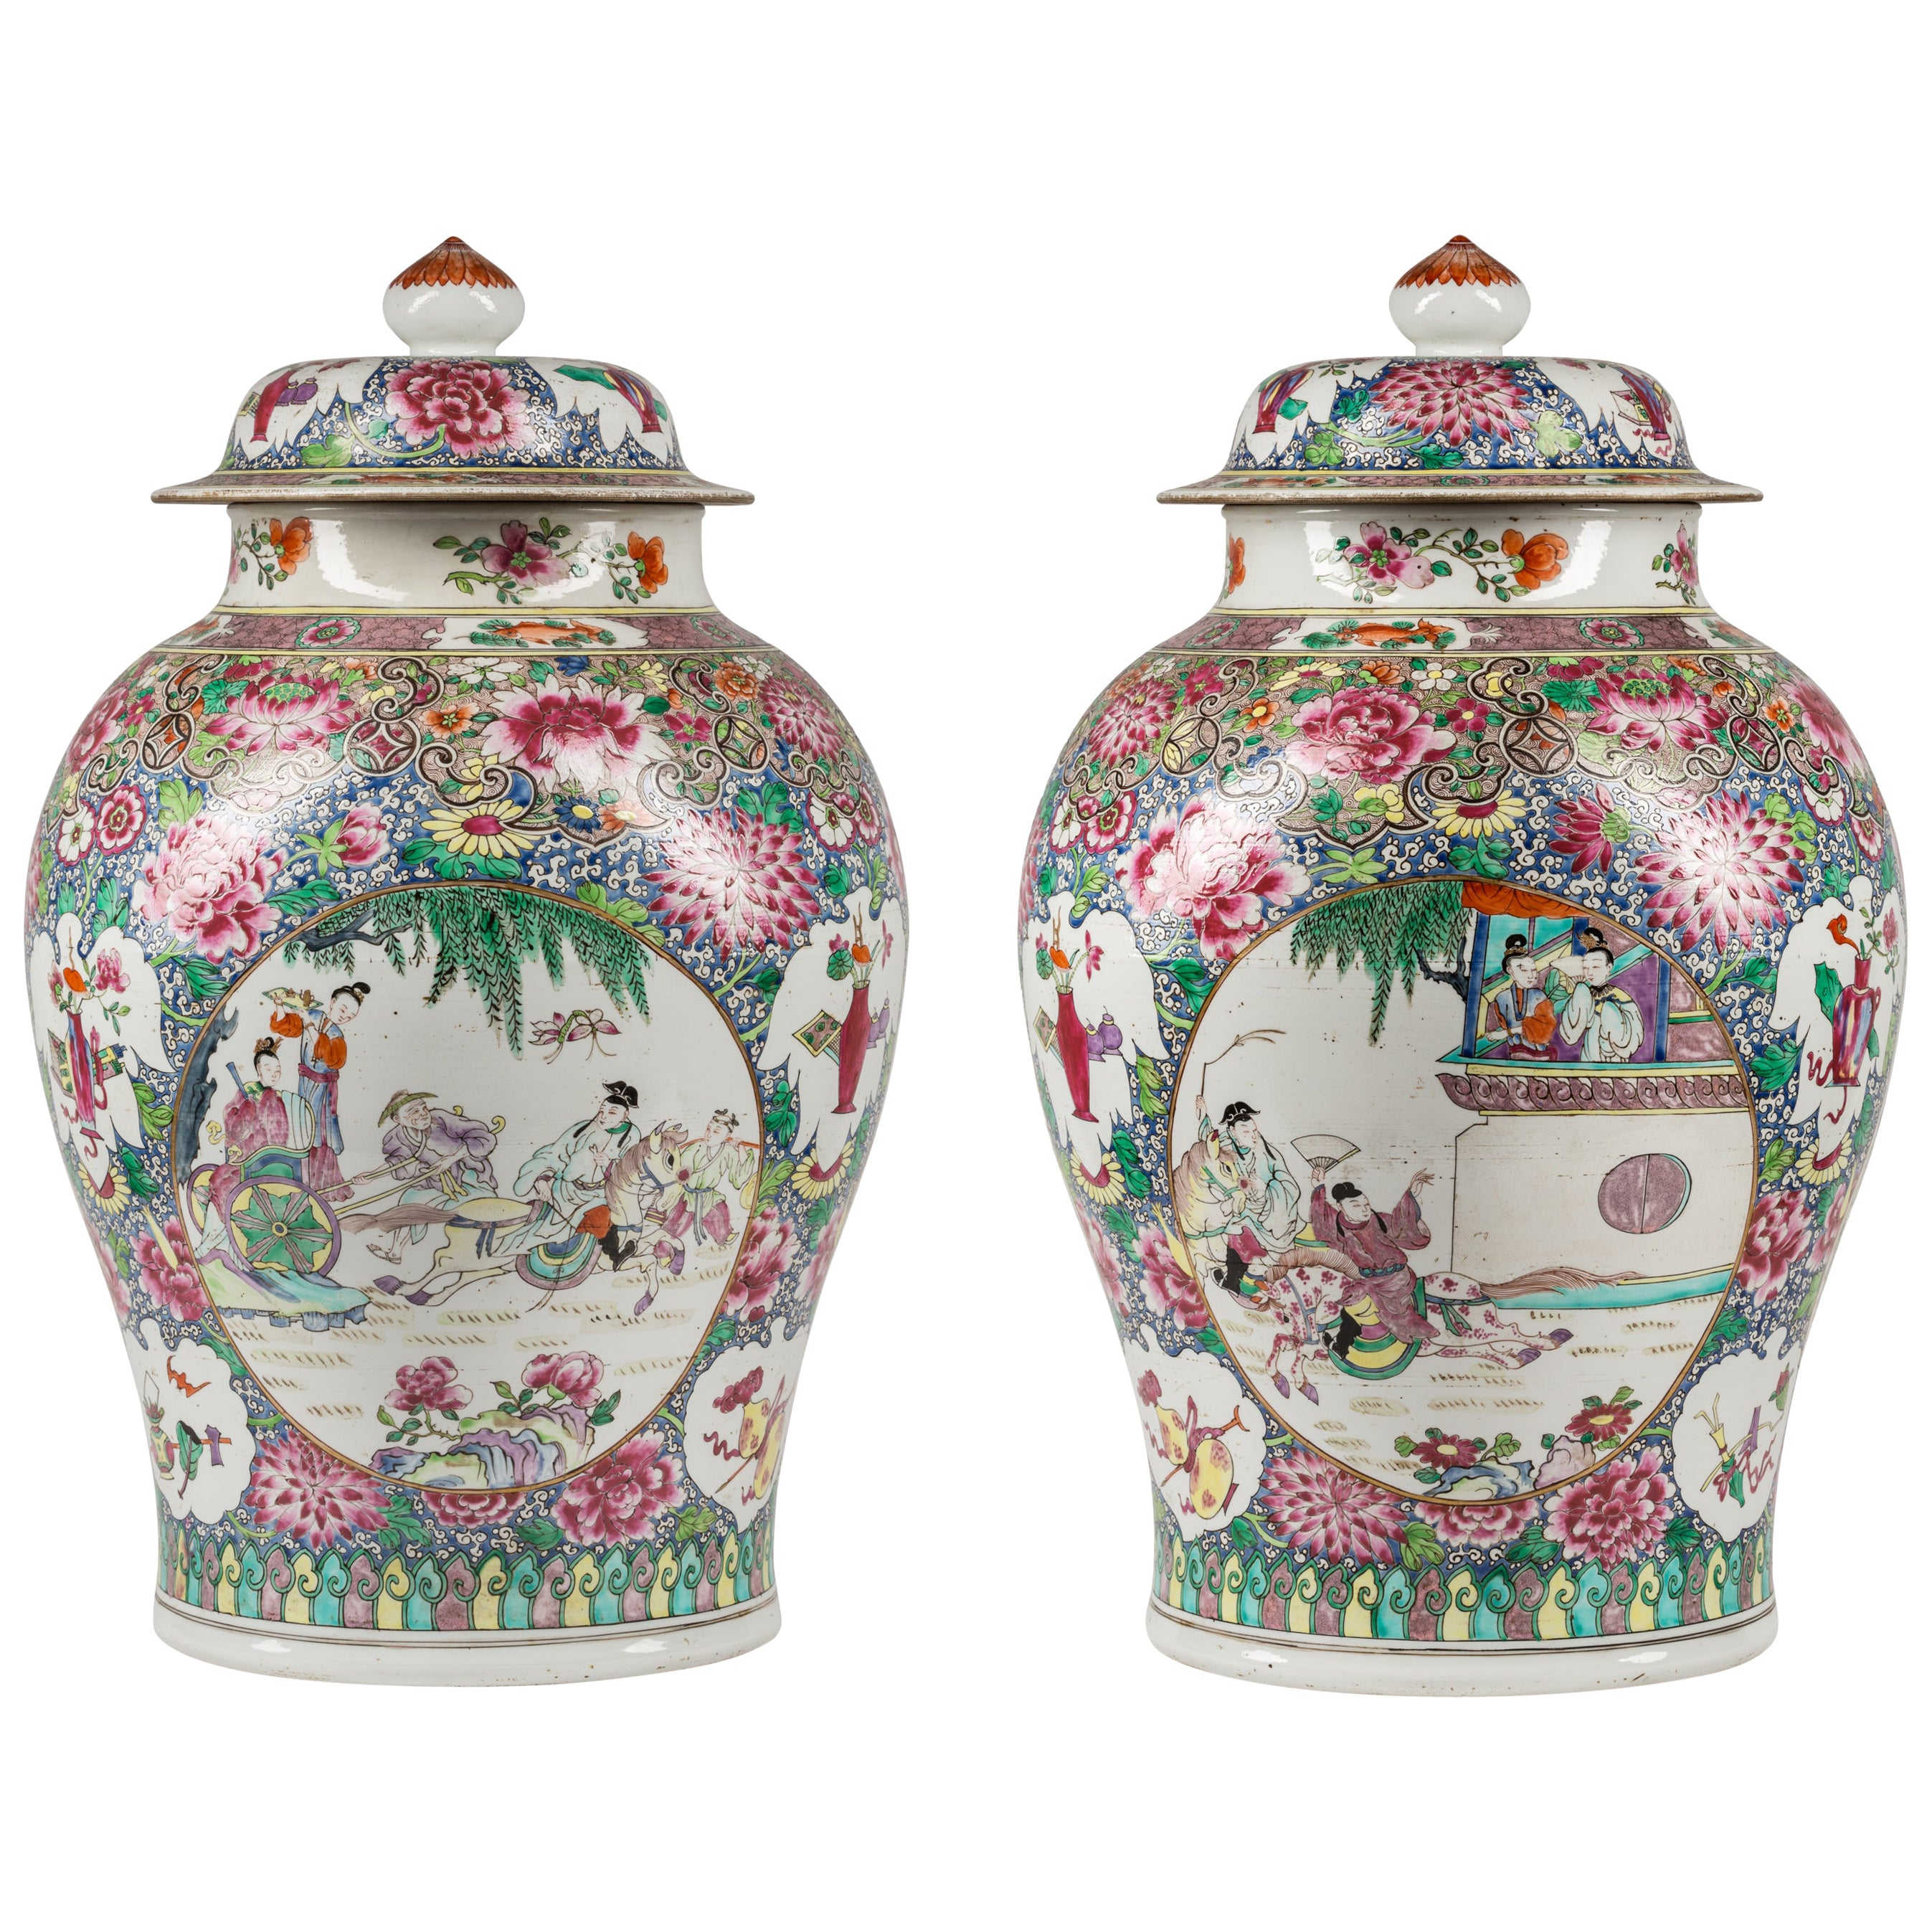 Pair of 19th Century Samson Edmé et Cie Porcelain Jars with Chinese Motif